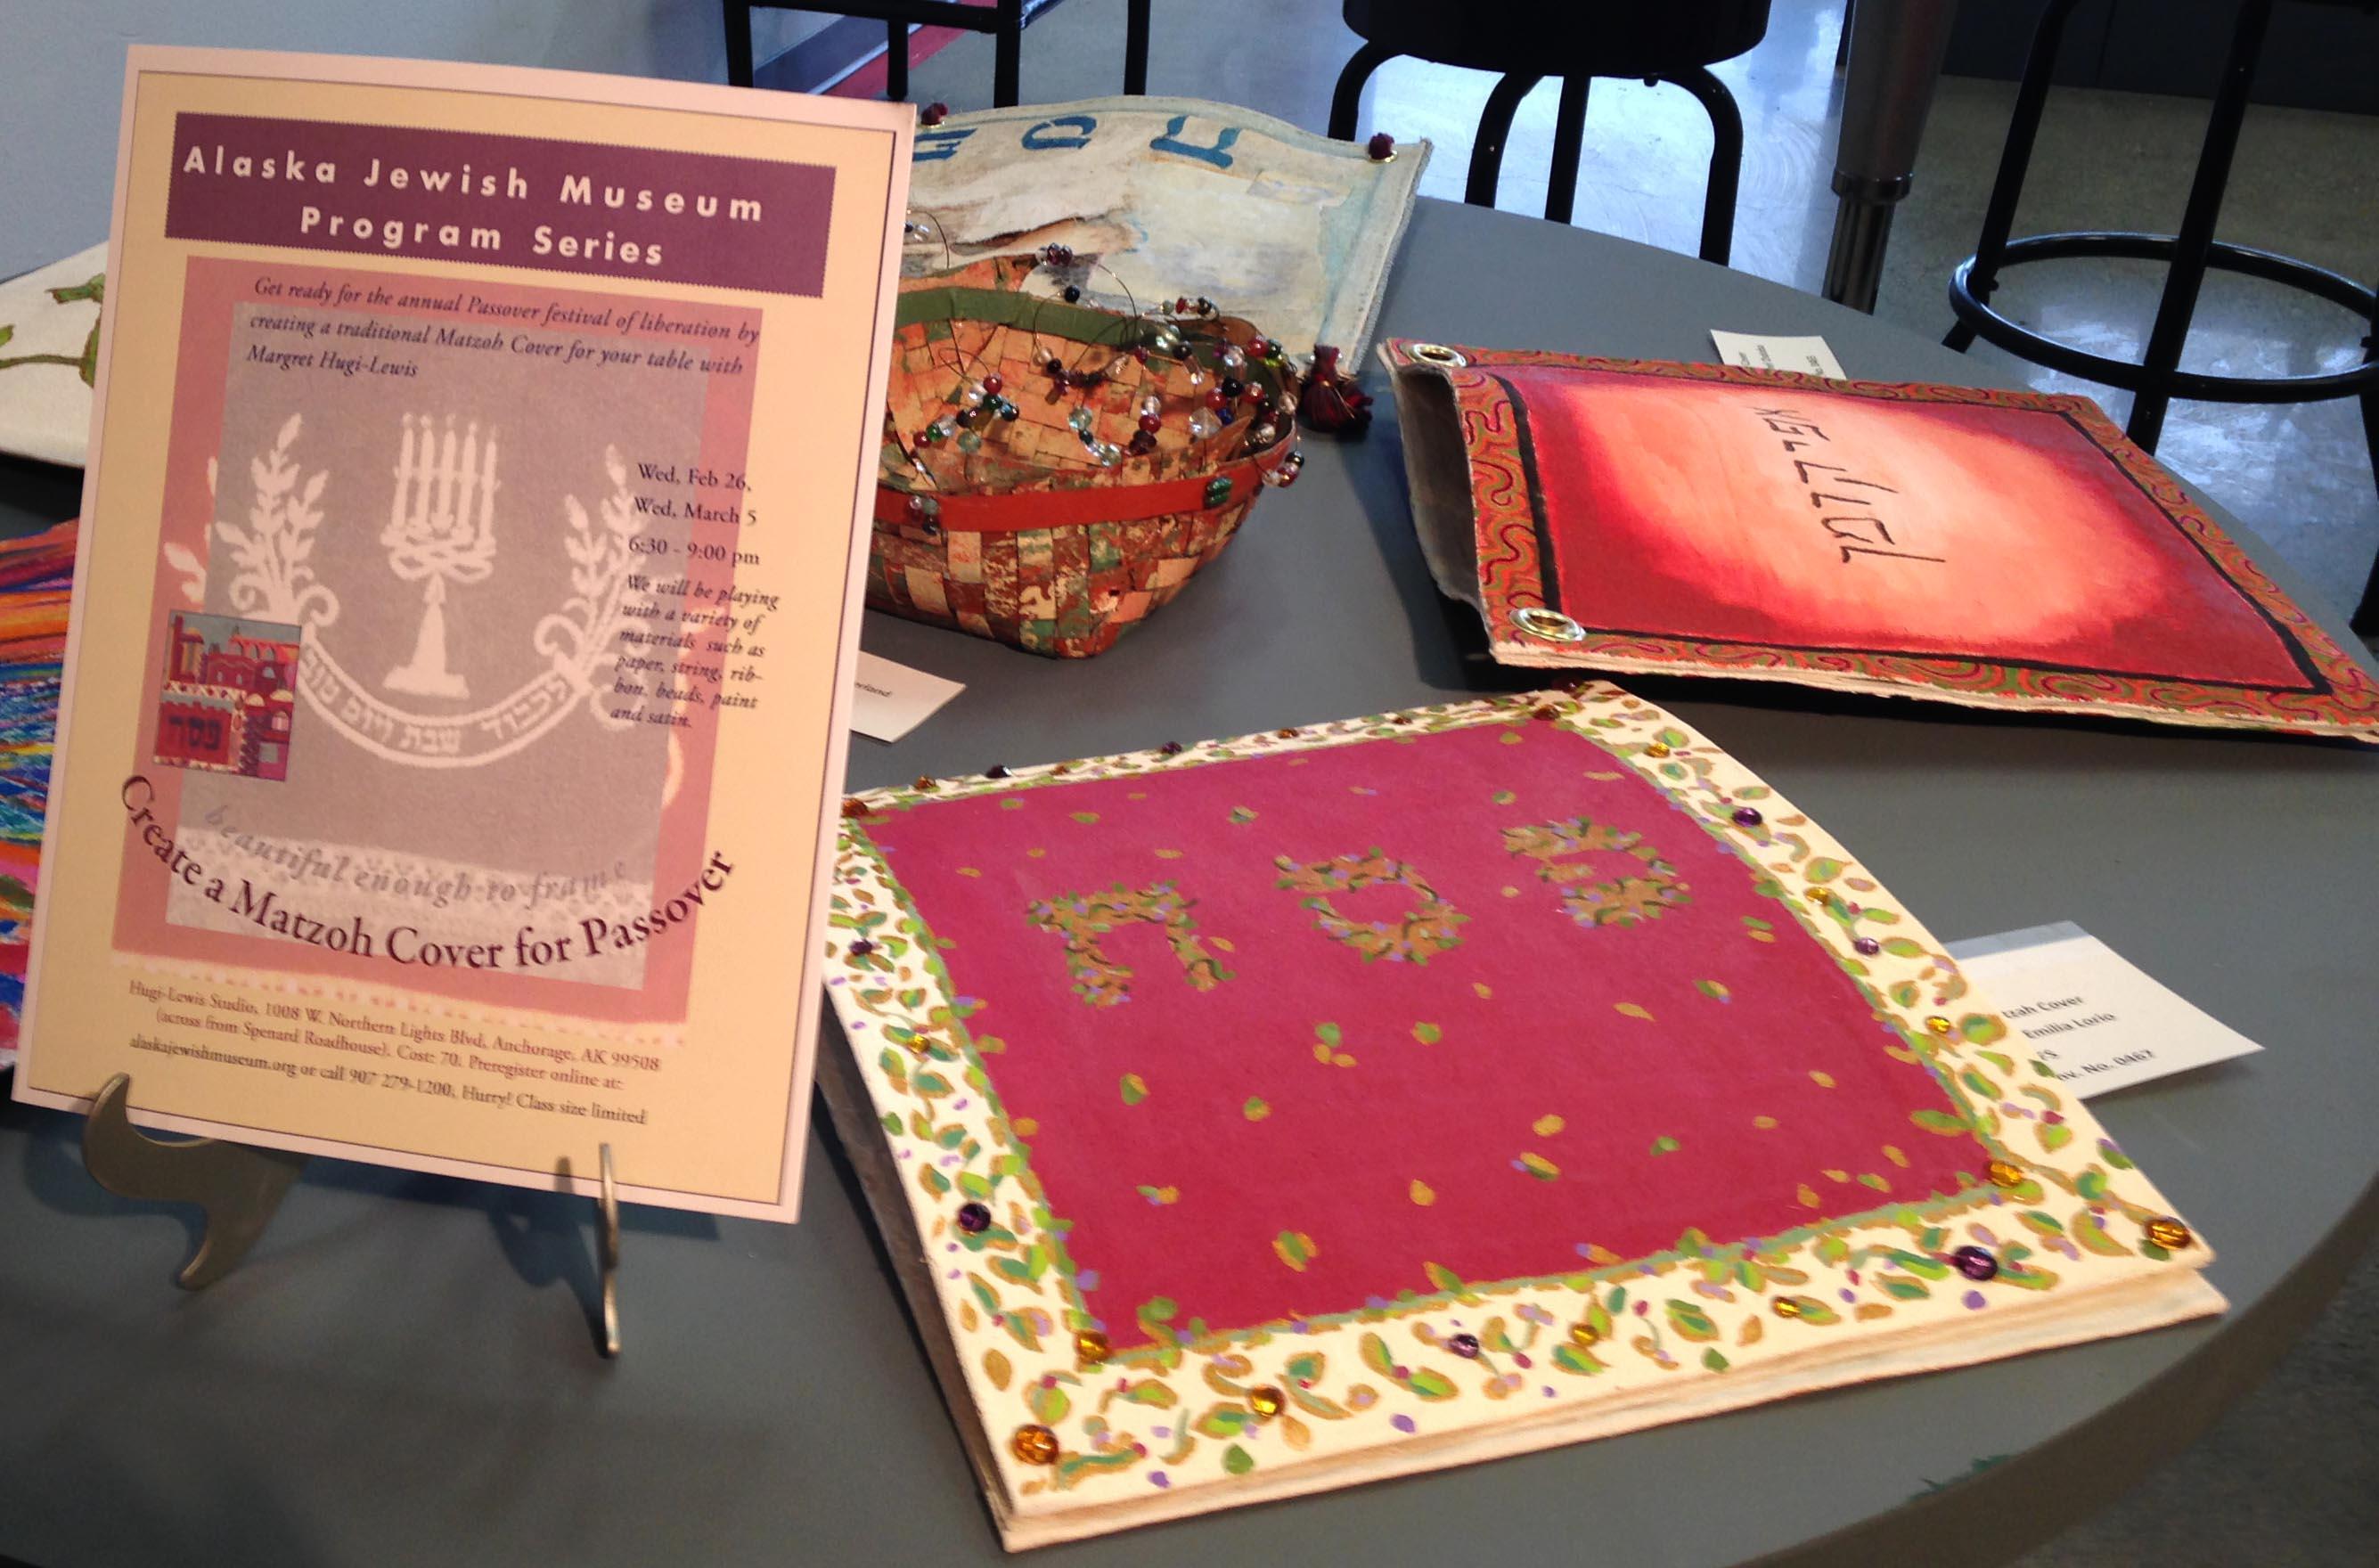 Matzoh Cover Workshop